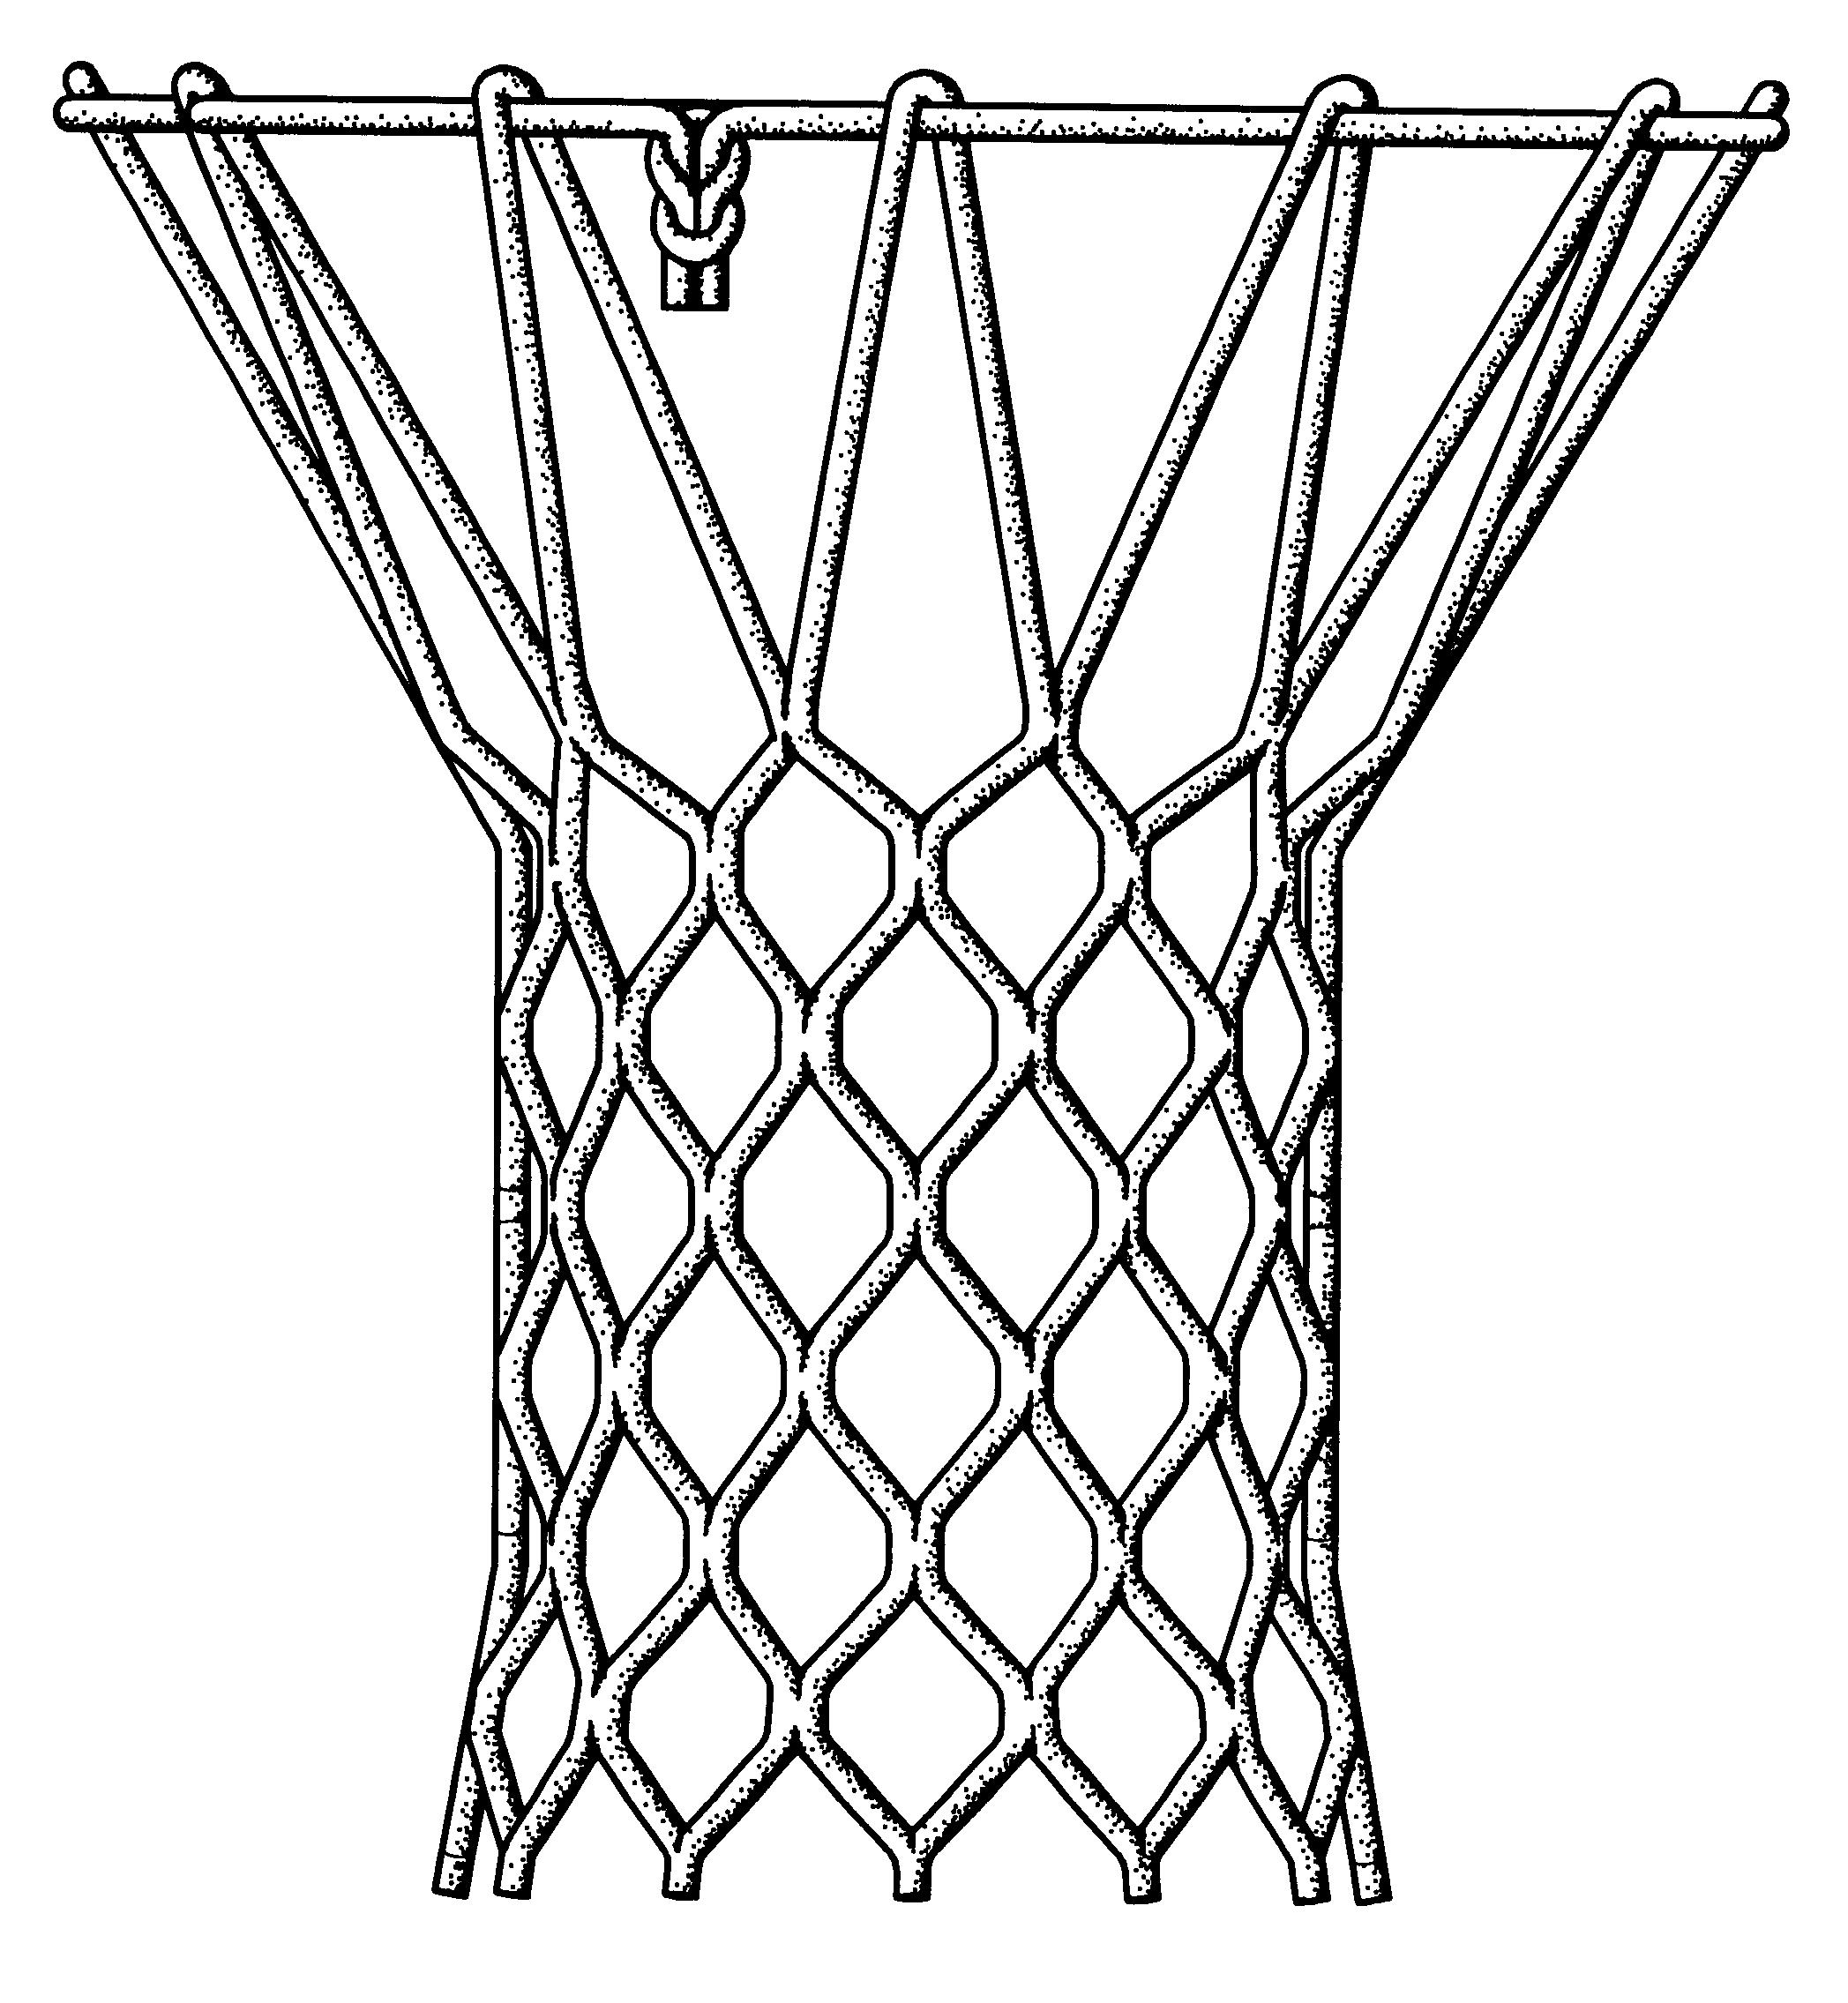 Basketball Drawings Of Nets